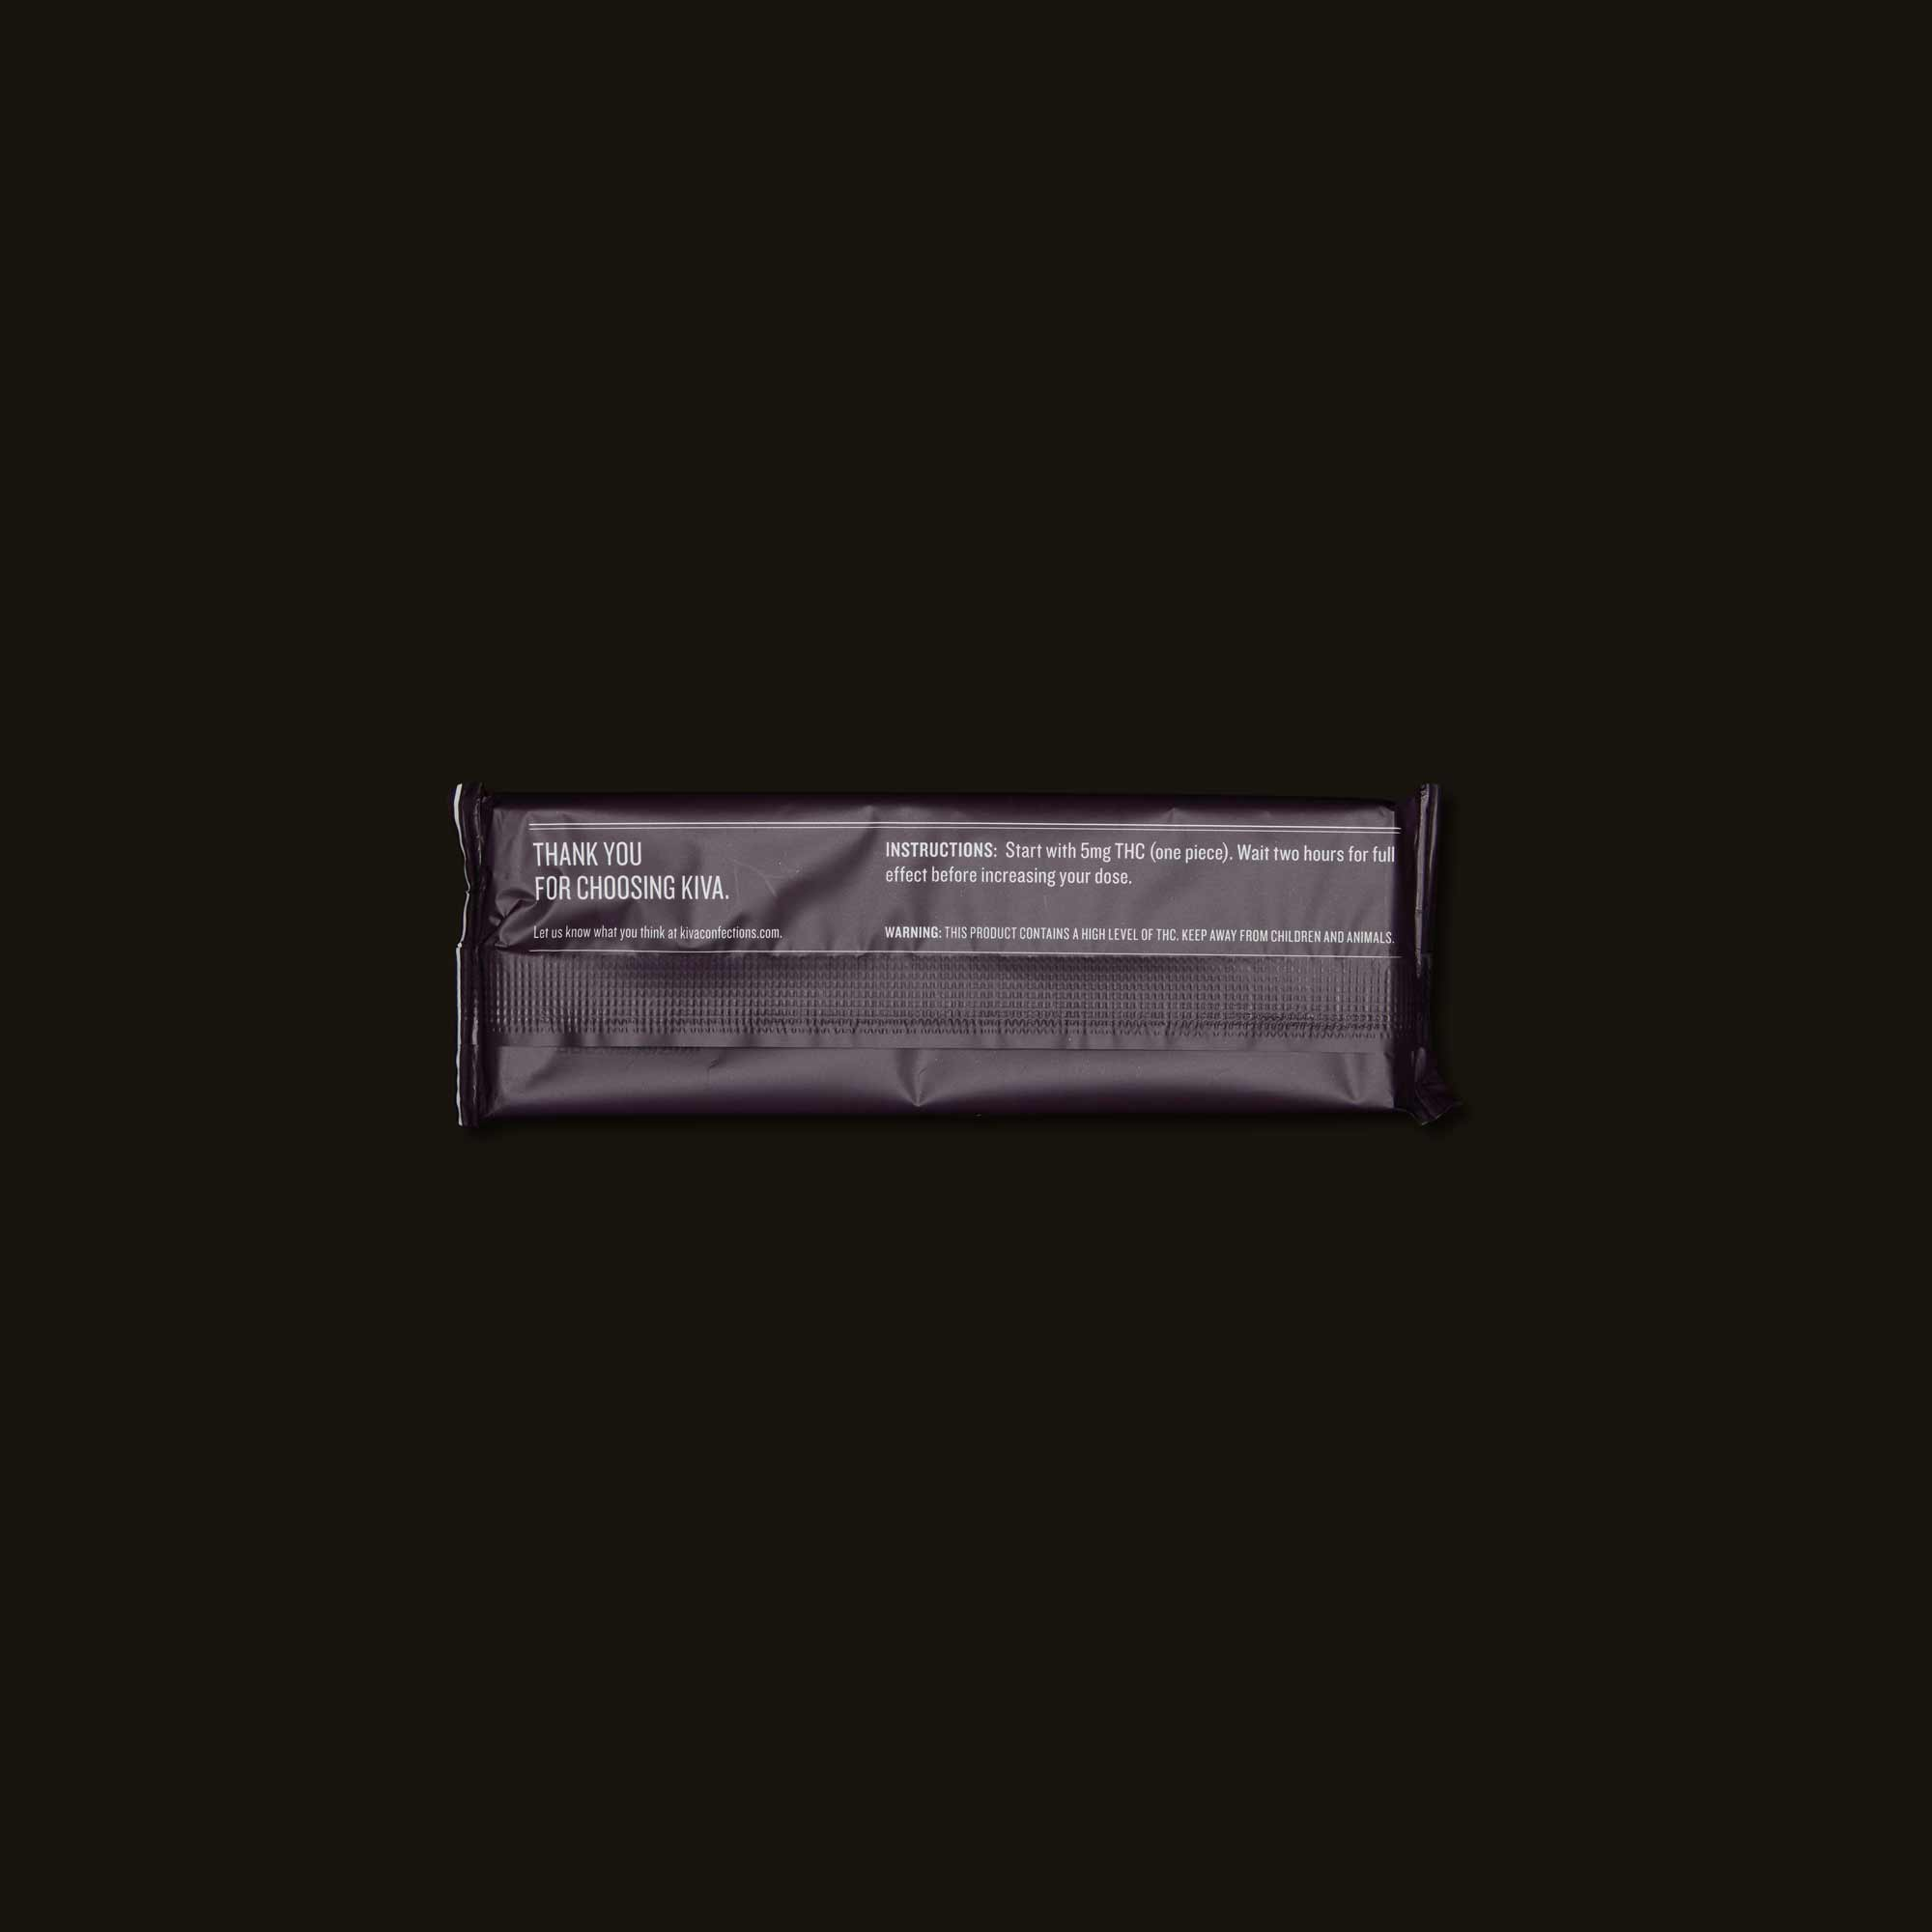 Dark Chocolate Kiva Bar - Edible for feeling Euphoric